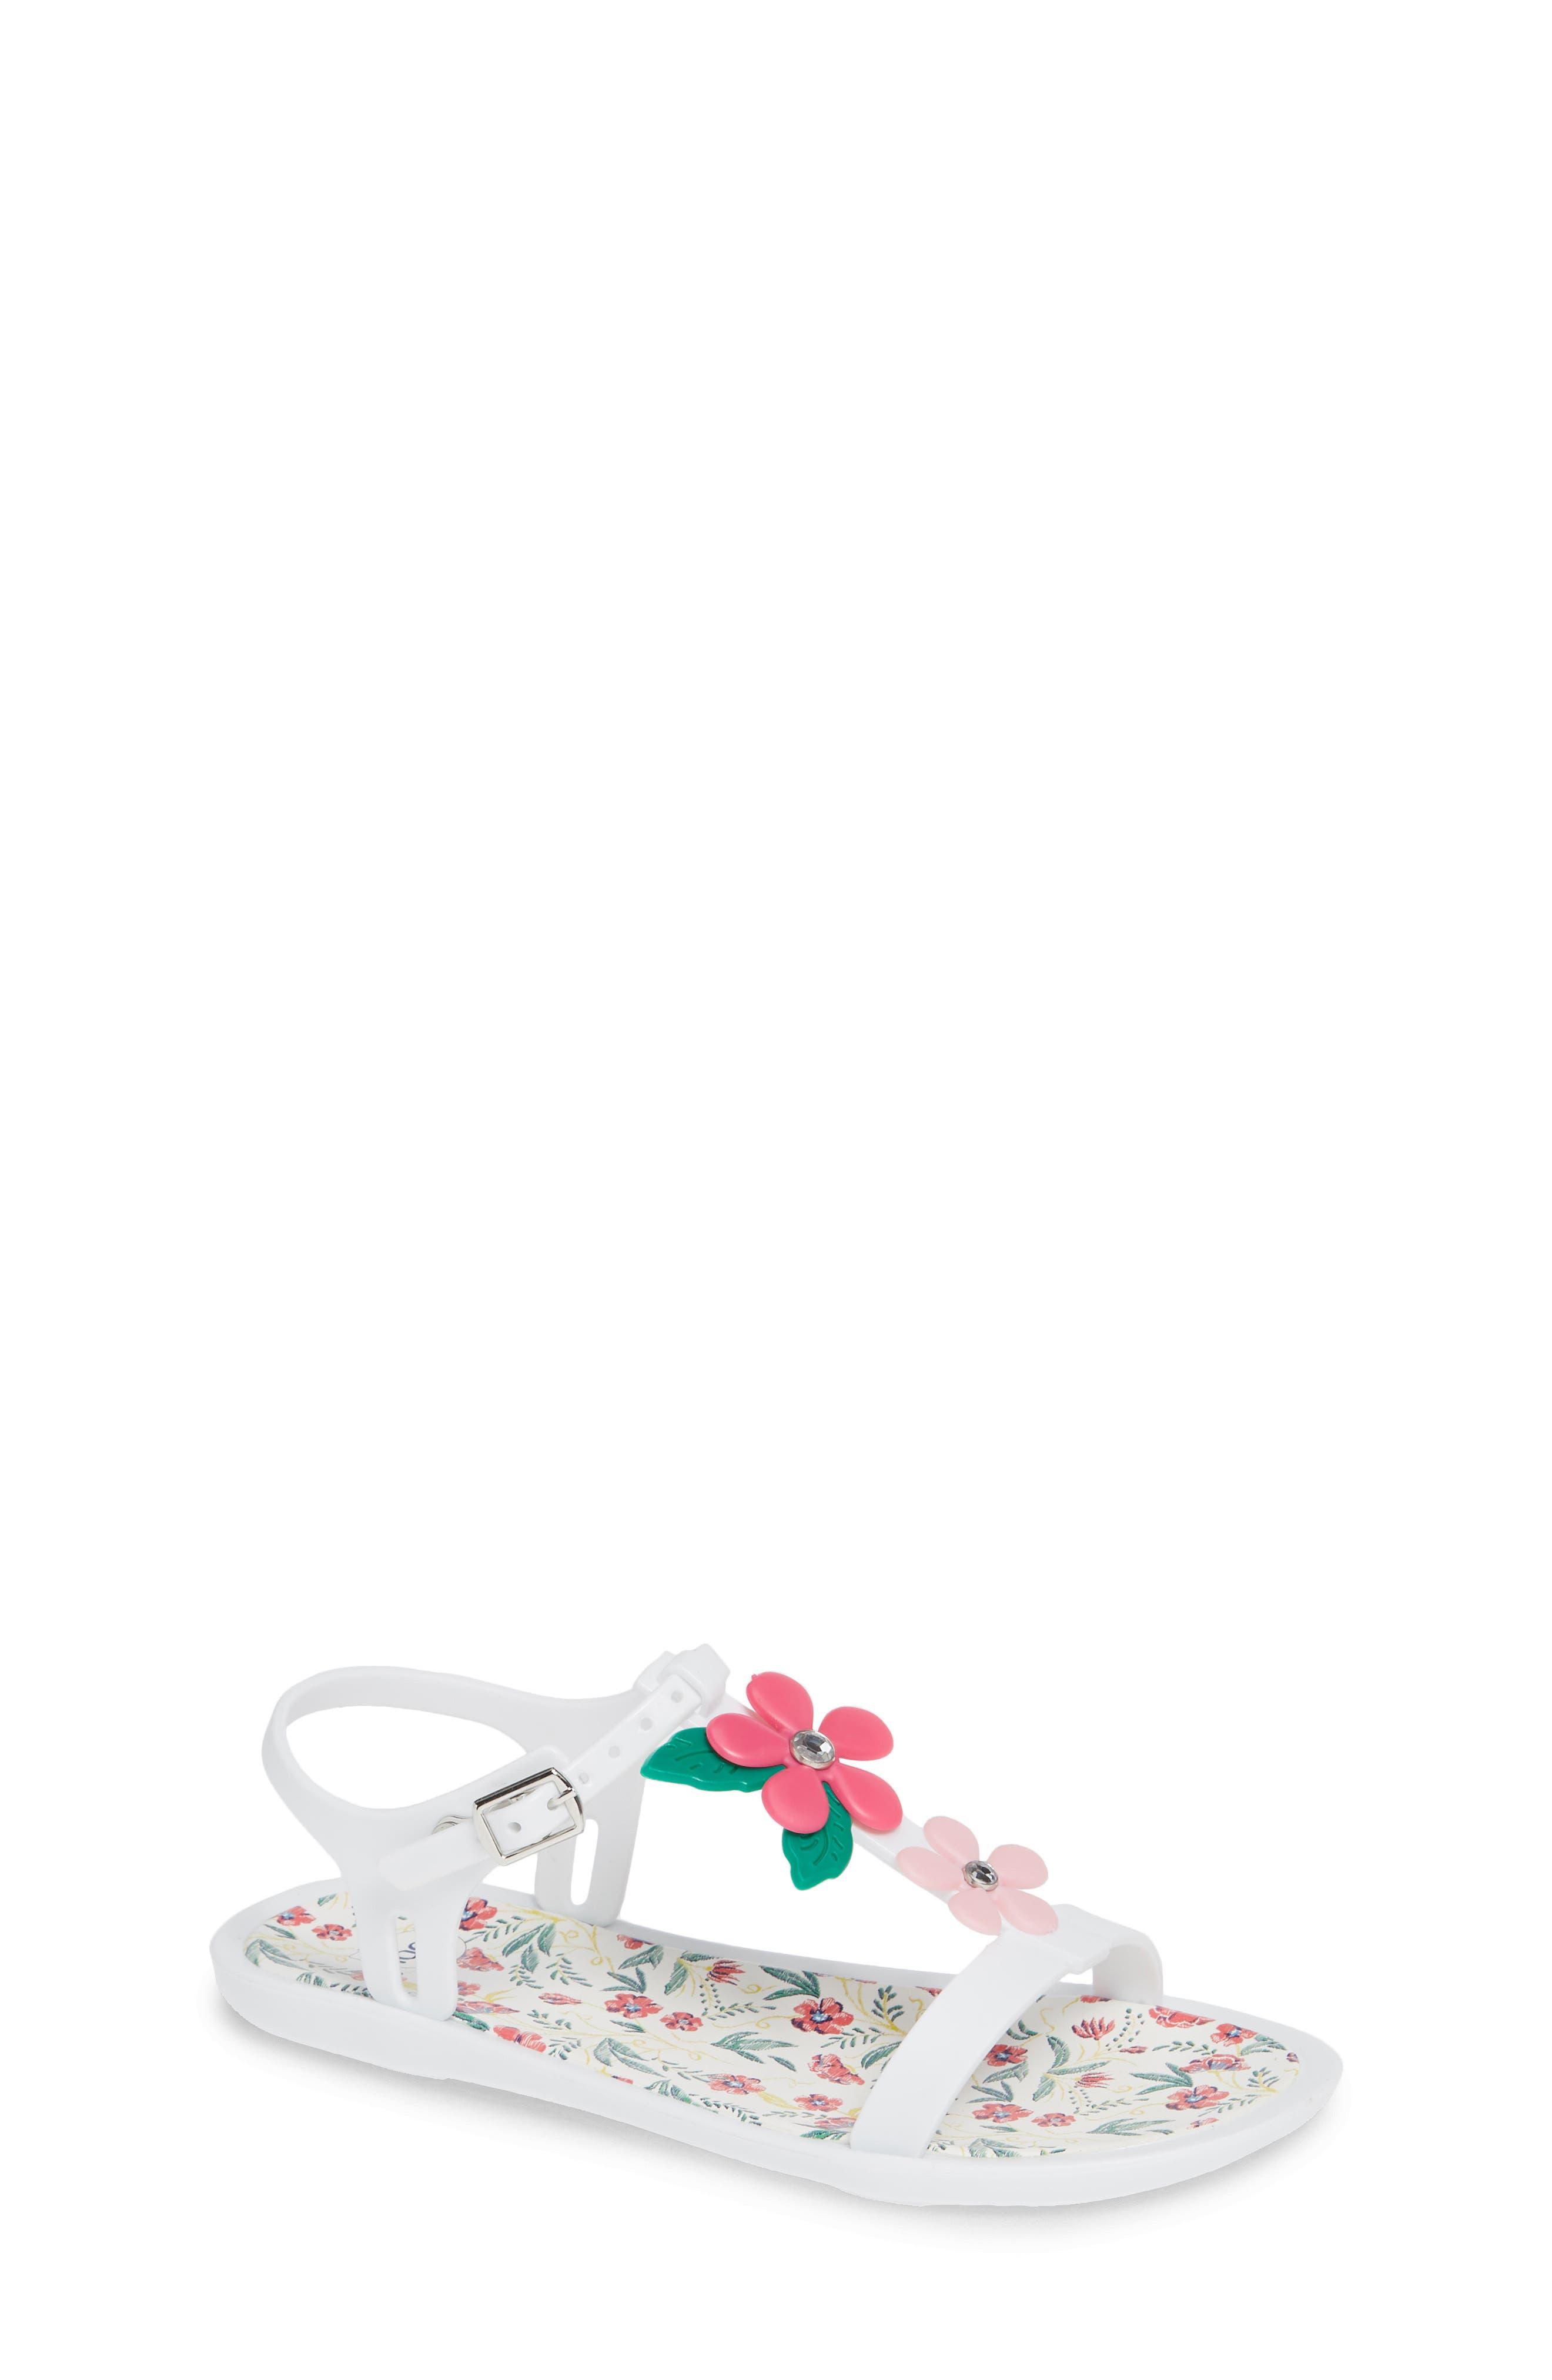 Tricia Floral T-Strap Sandal,                             Main thumbnail 1, color,                             White